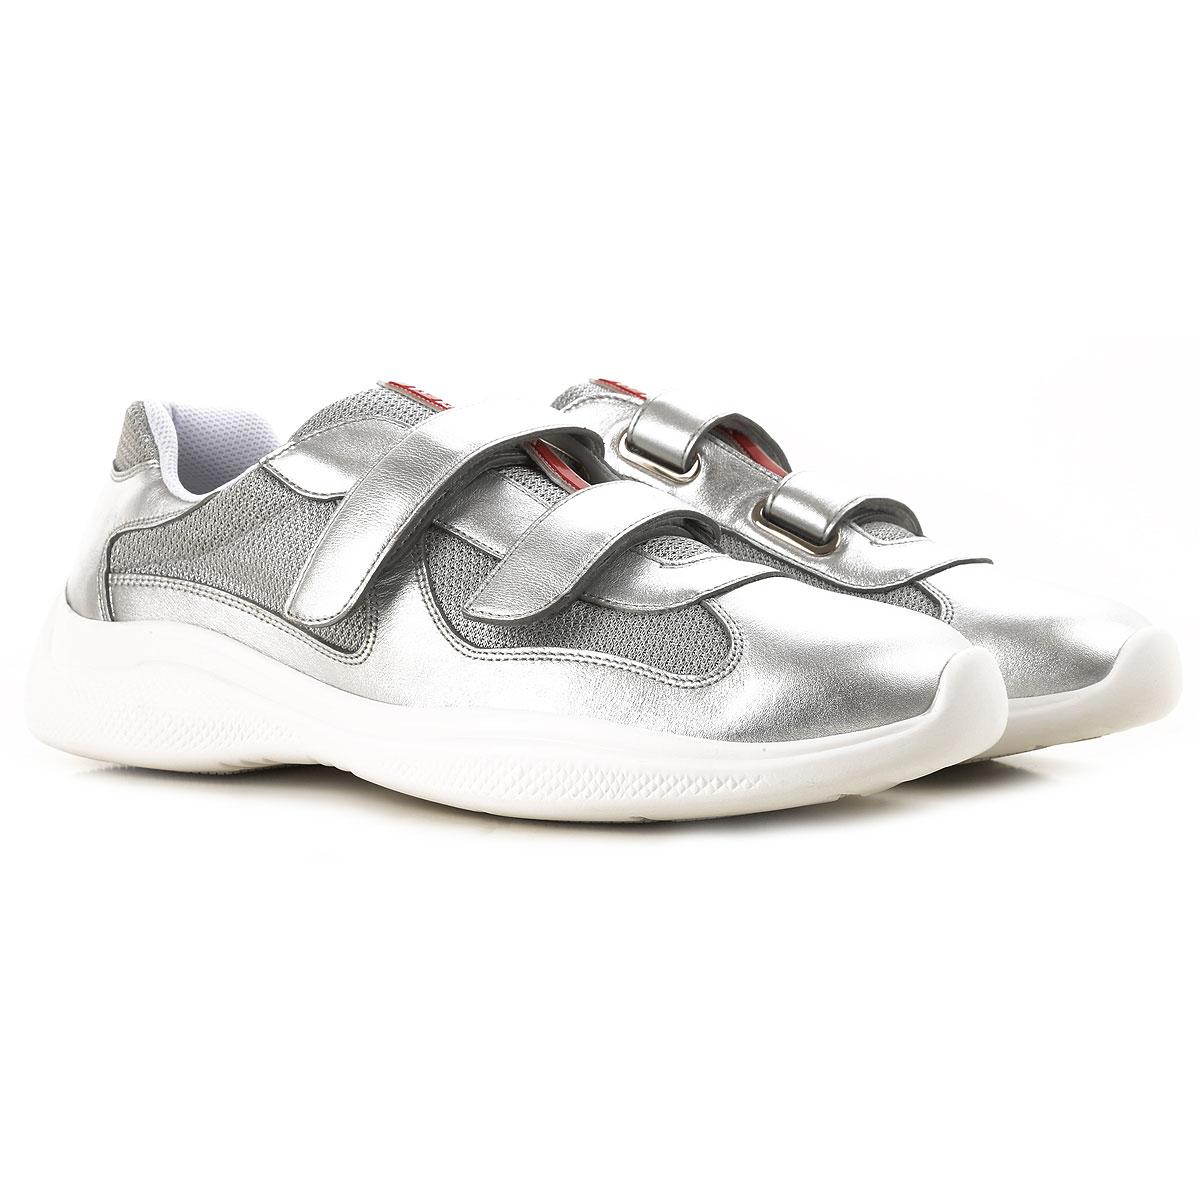 c7dc9bcd Mens Shoes Prada, Style code: 403305-6gw-118